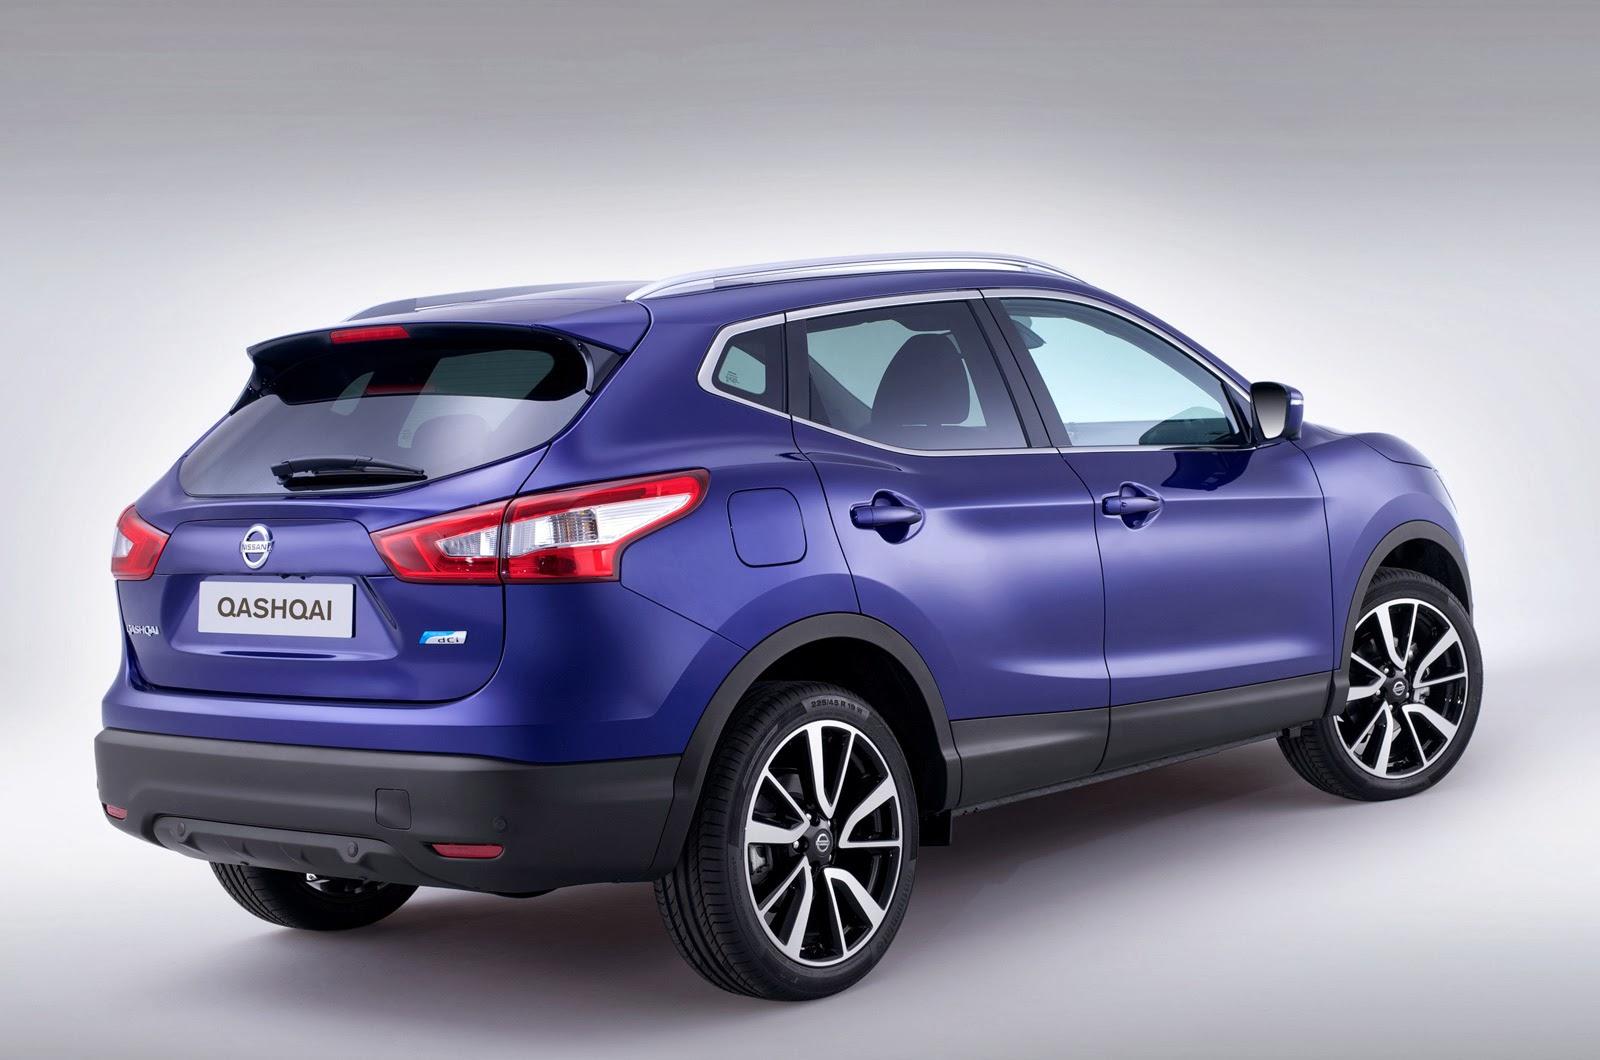 Nuova Nissan Qashqai 2014 Foto E Video